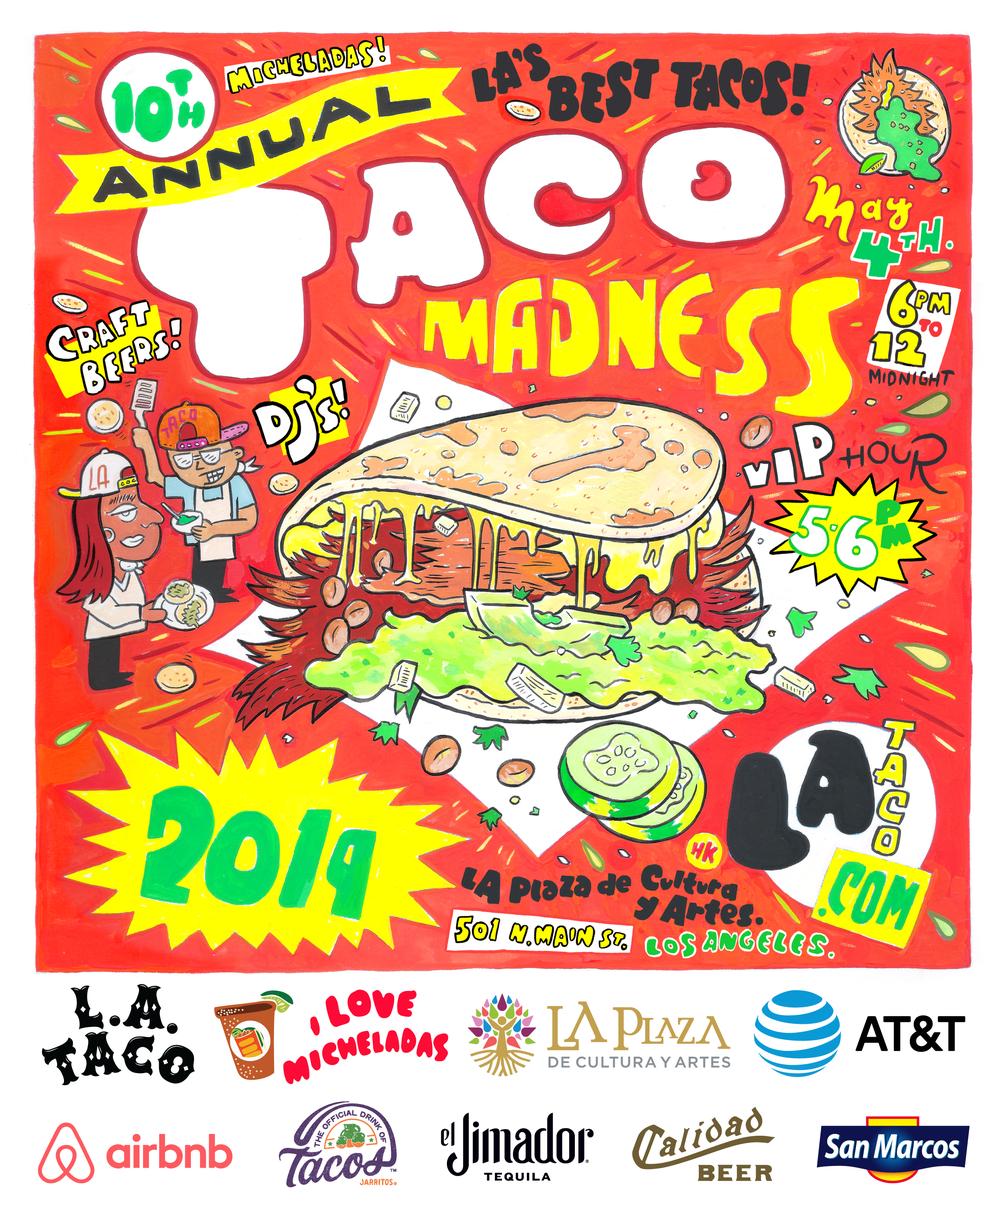 TACO-MADNESS-2019 Sponsors v2.png